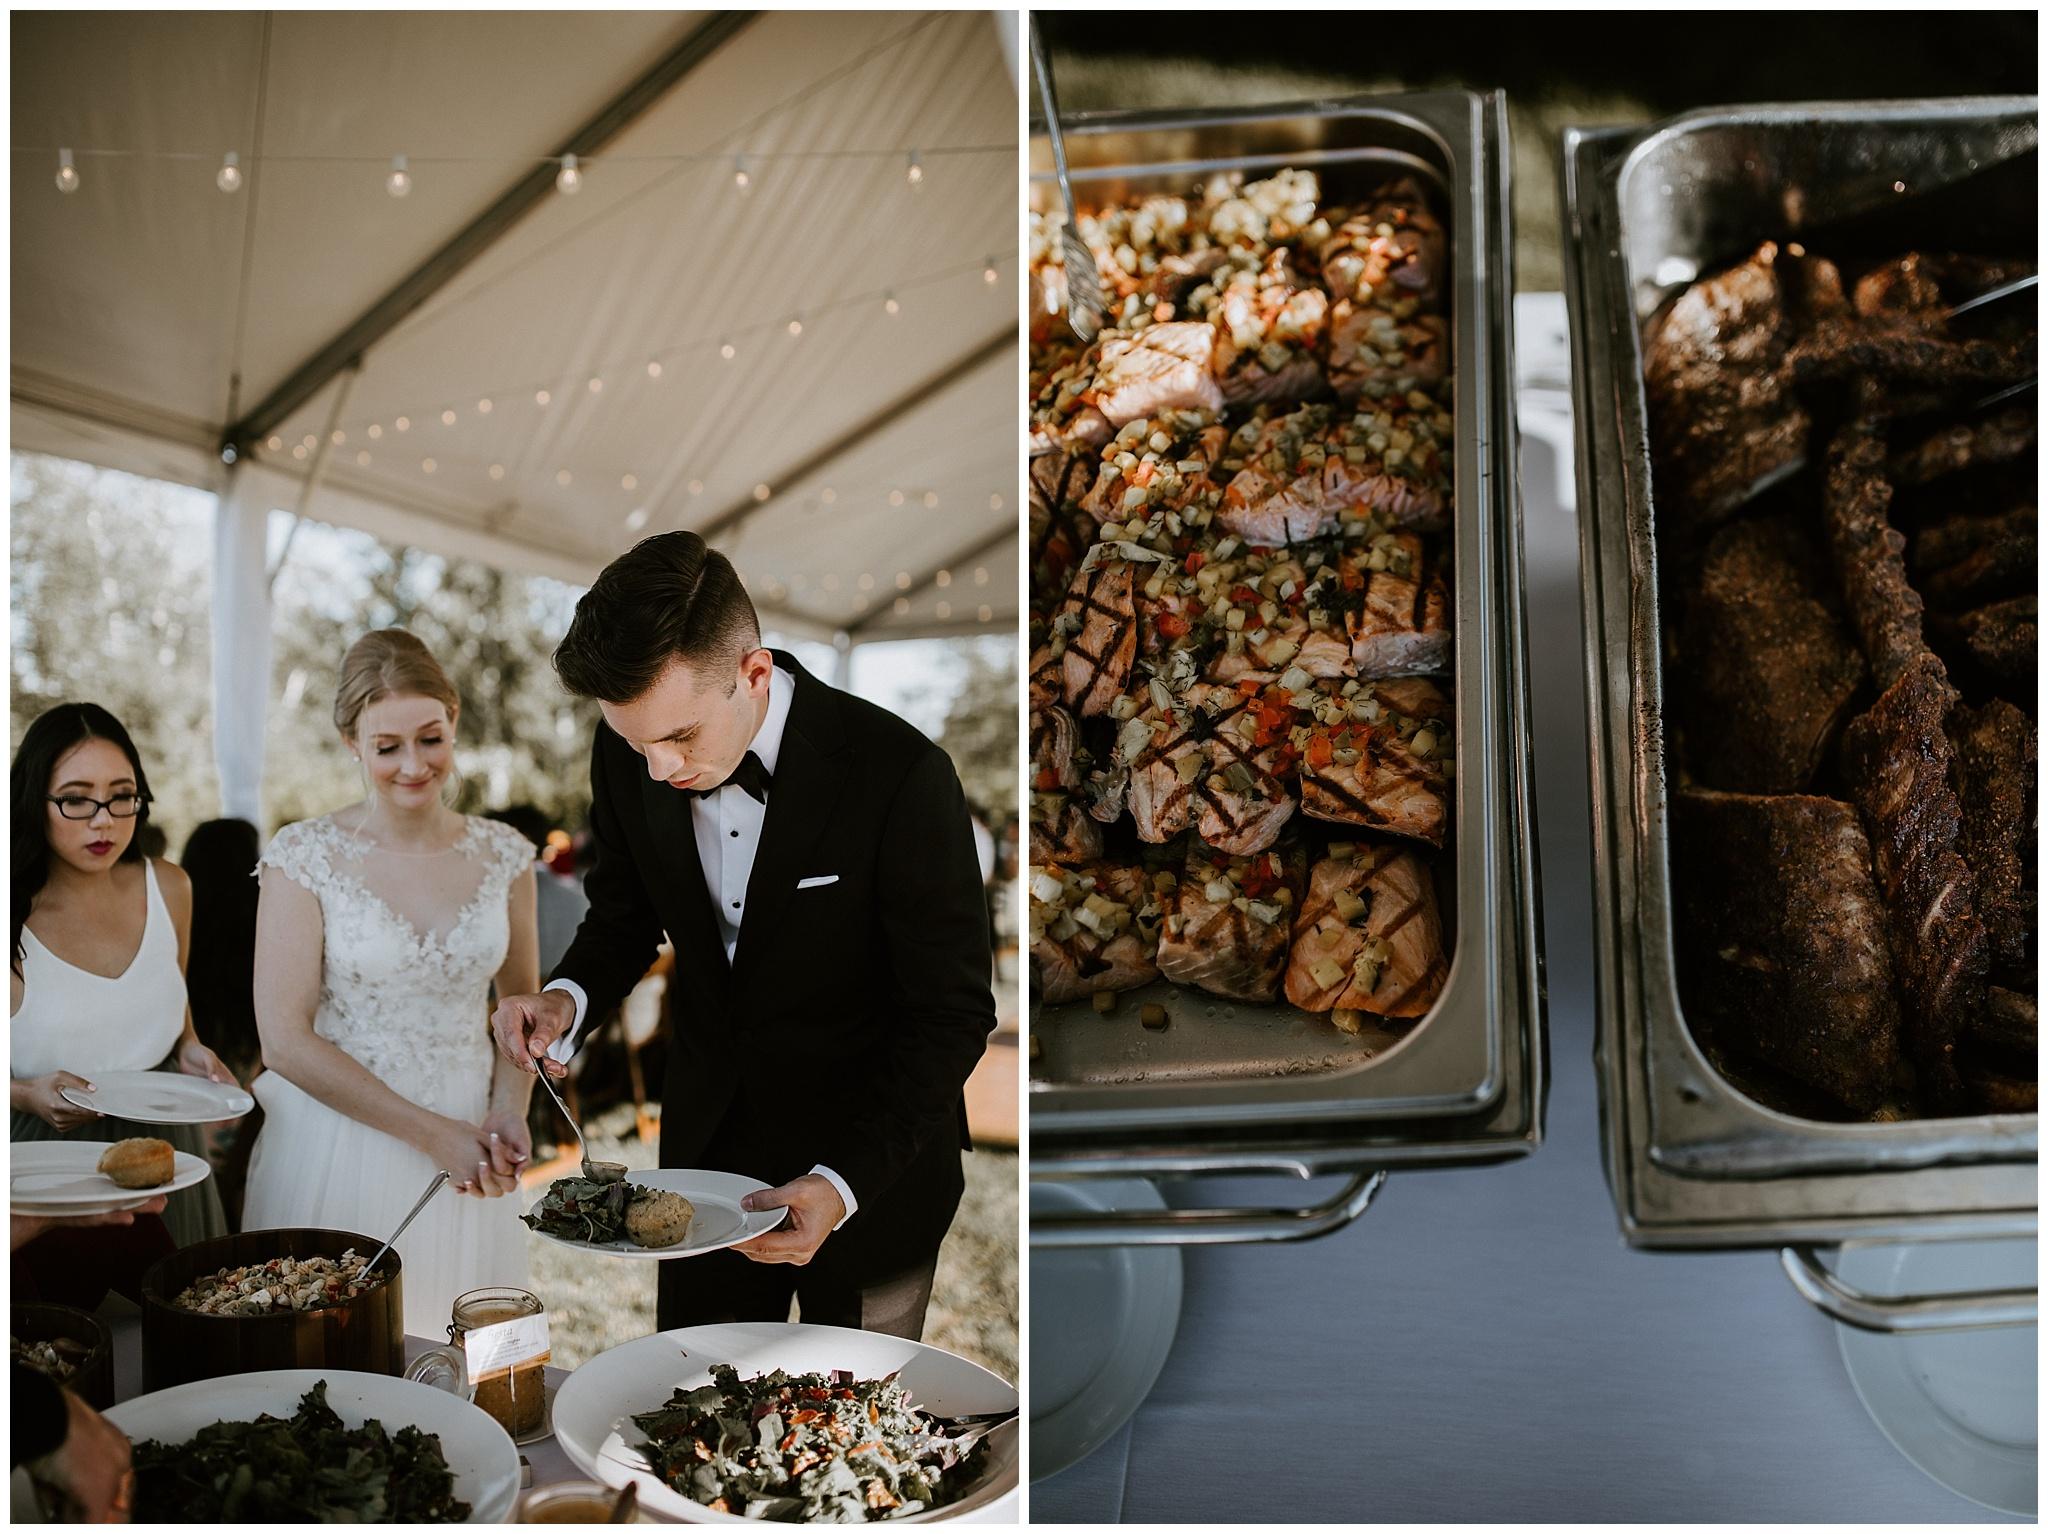 fort-langley-backyard-wedding-28.JPG